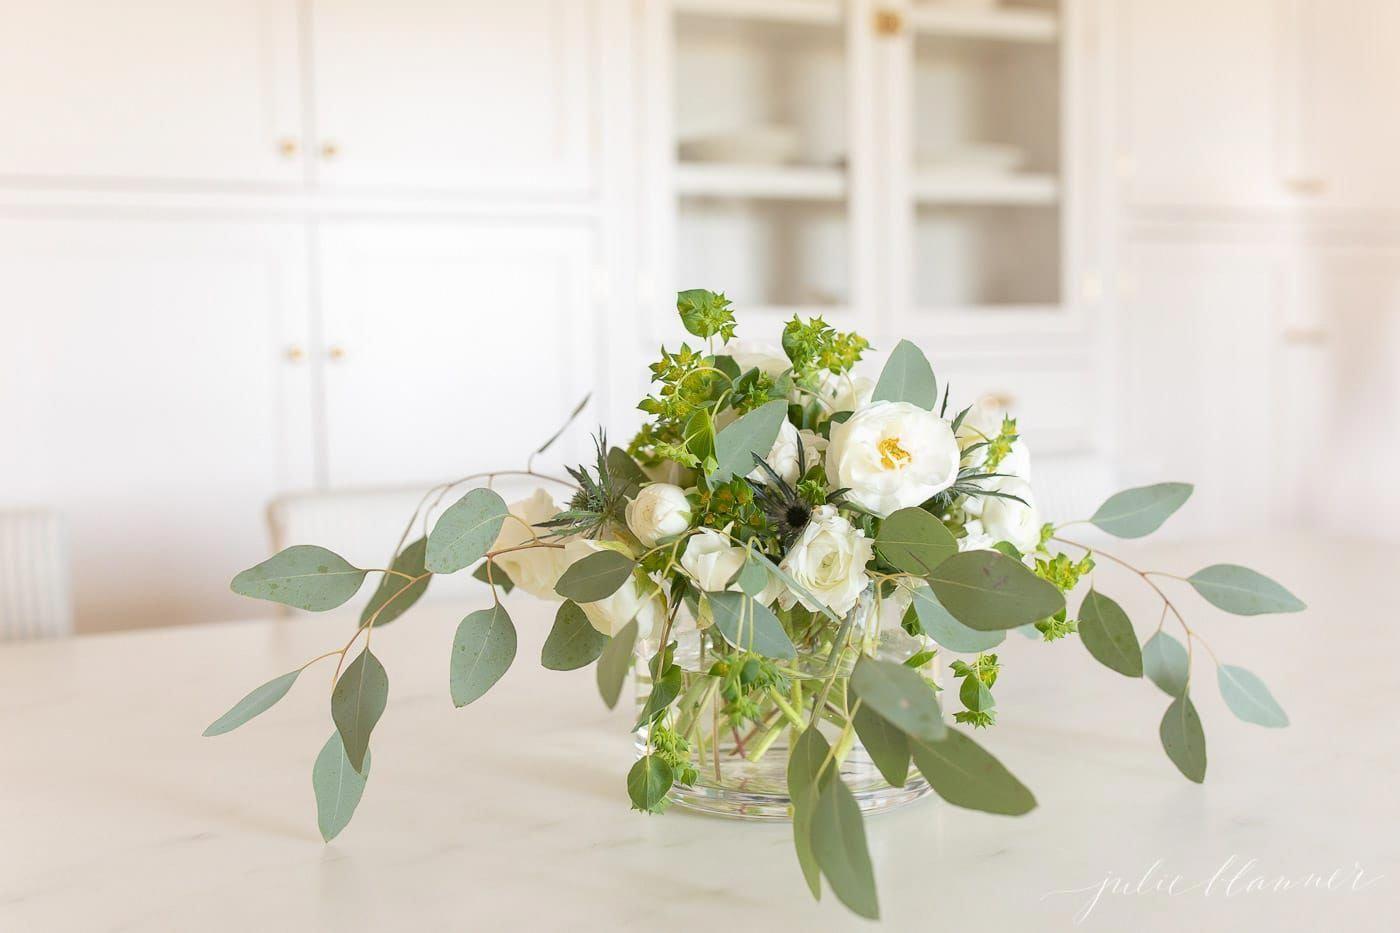 Ranunculus Bouquet Uk Ranunculus Flower Centerpieces Wedding Ranunculus Centerpiece Ranunculus Arrangement